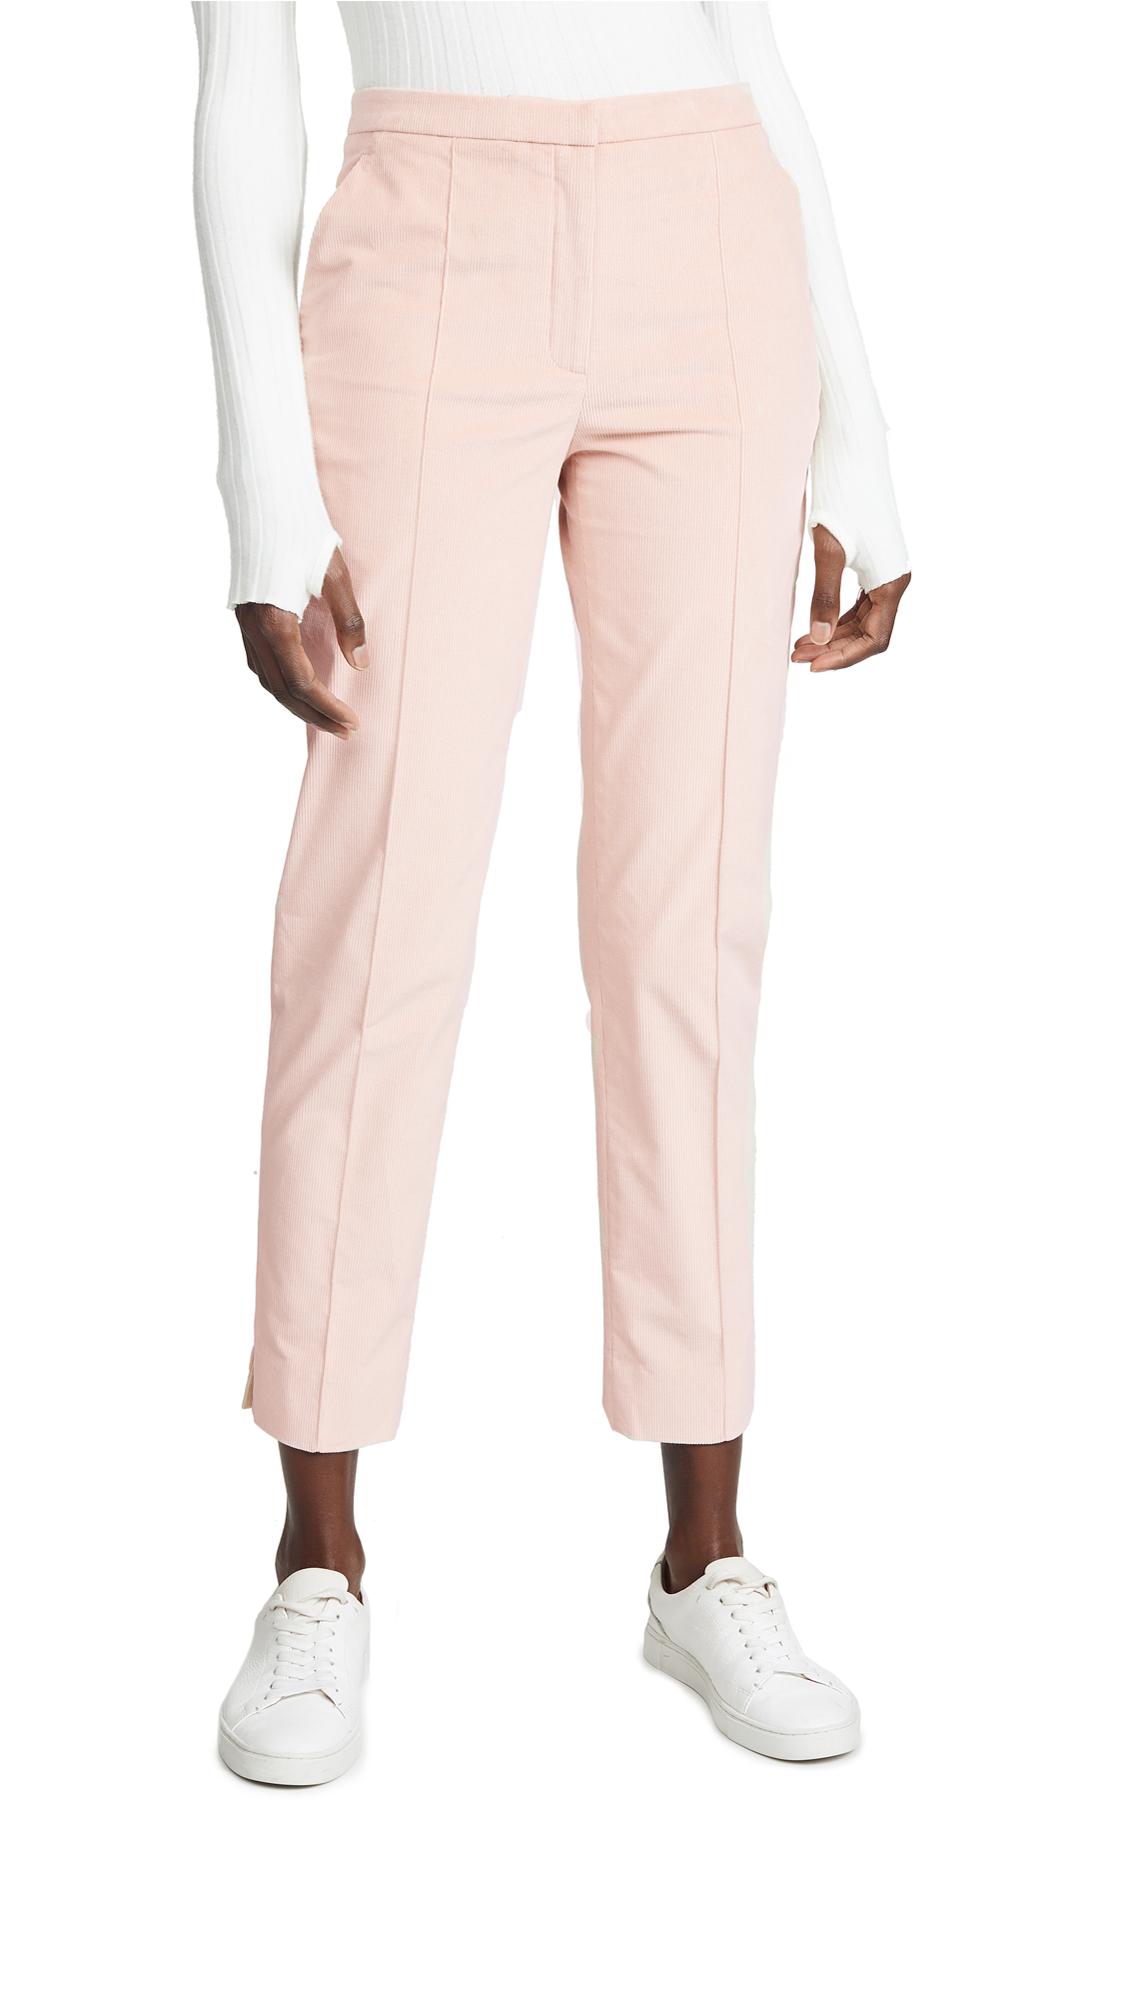 Nina Ricci Straight Leg Trousers - Powder Beige